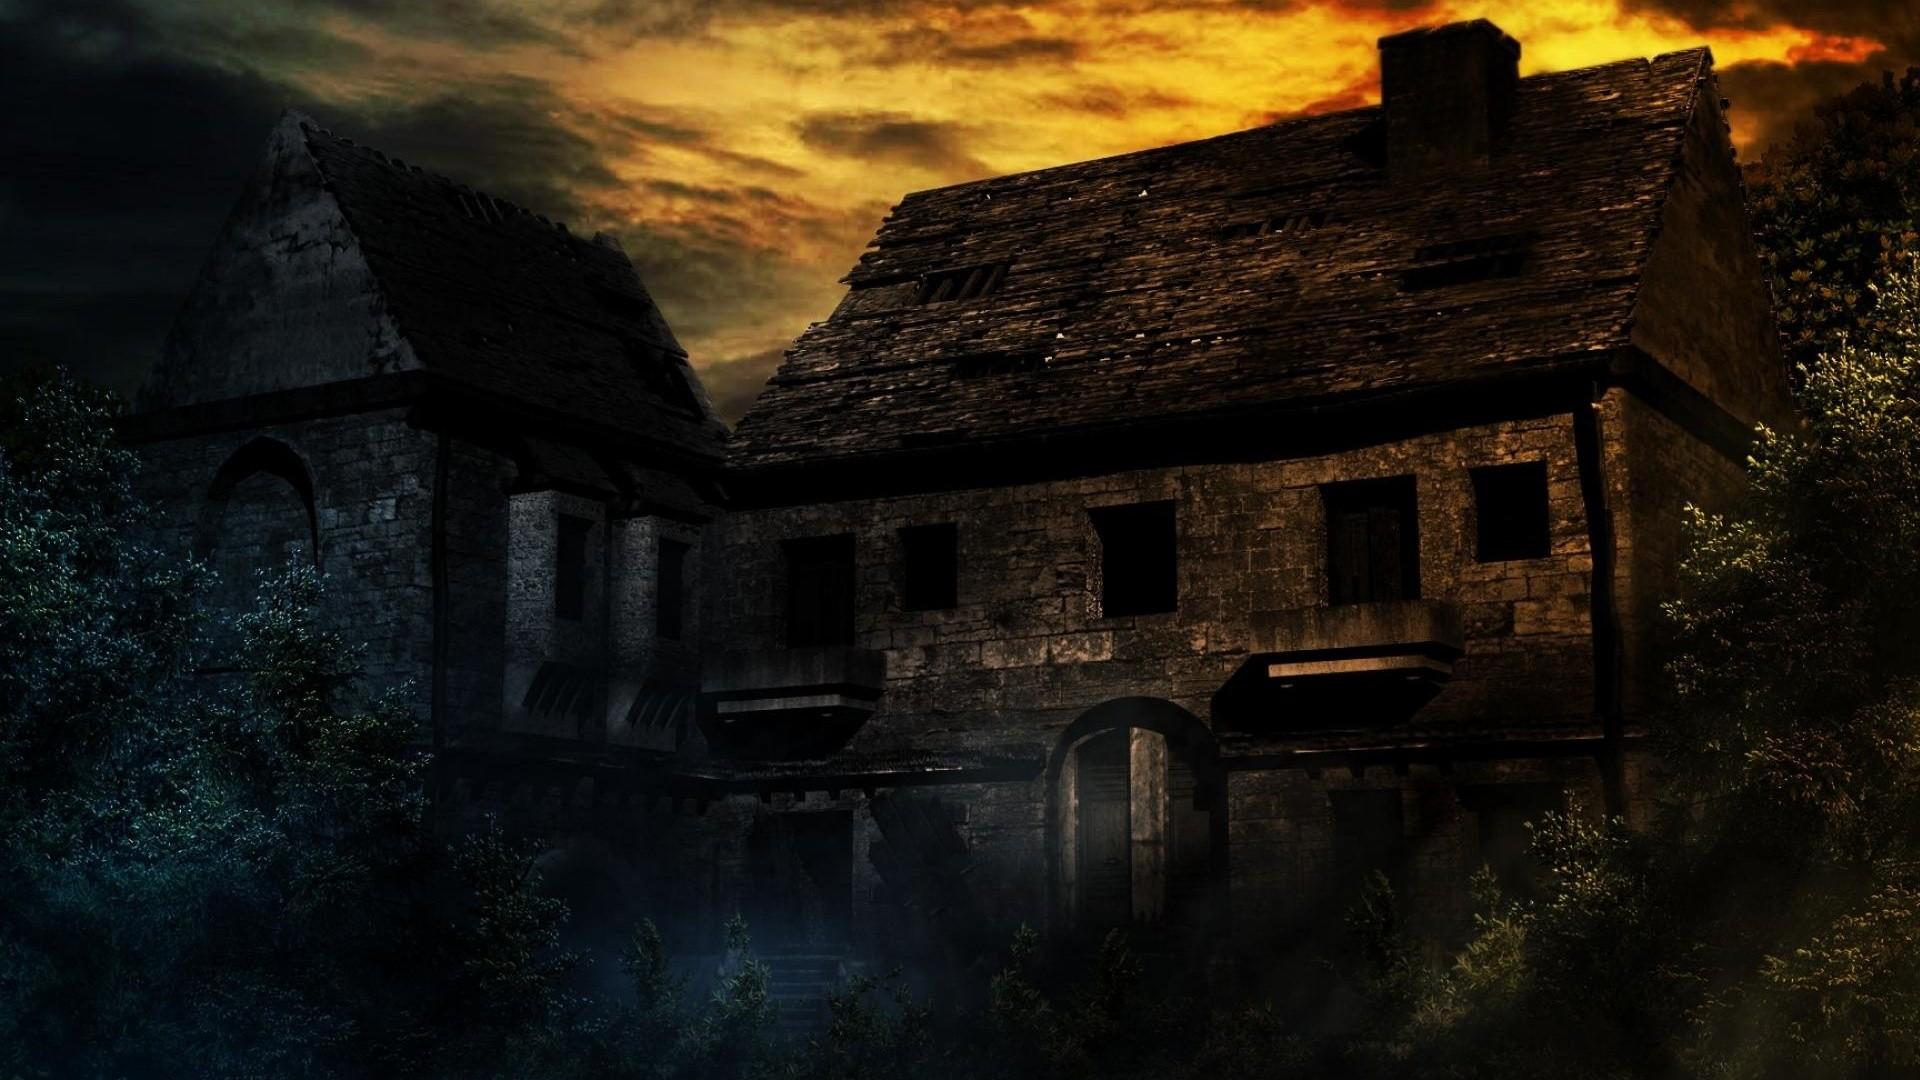 Scary Halloween HD Wallpaper. Scary Halloween Image Free.